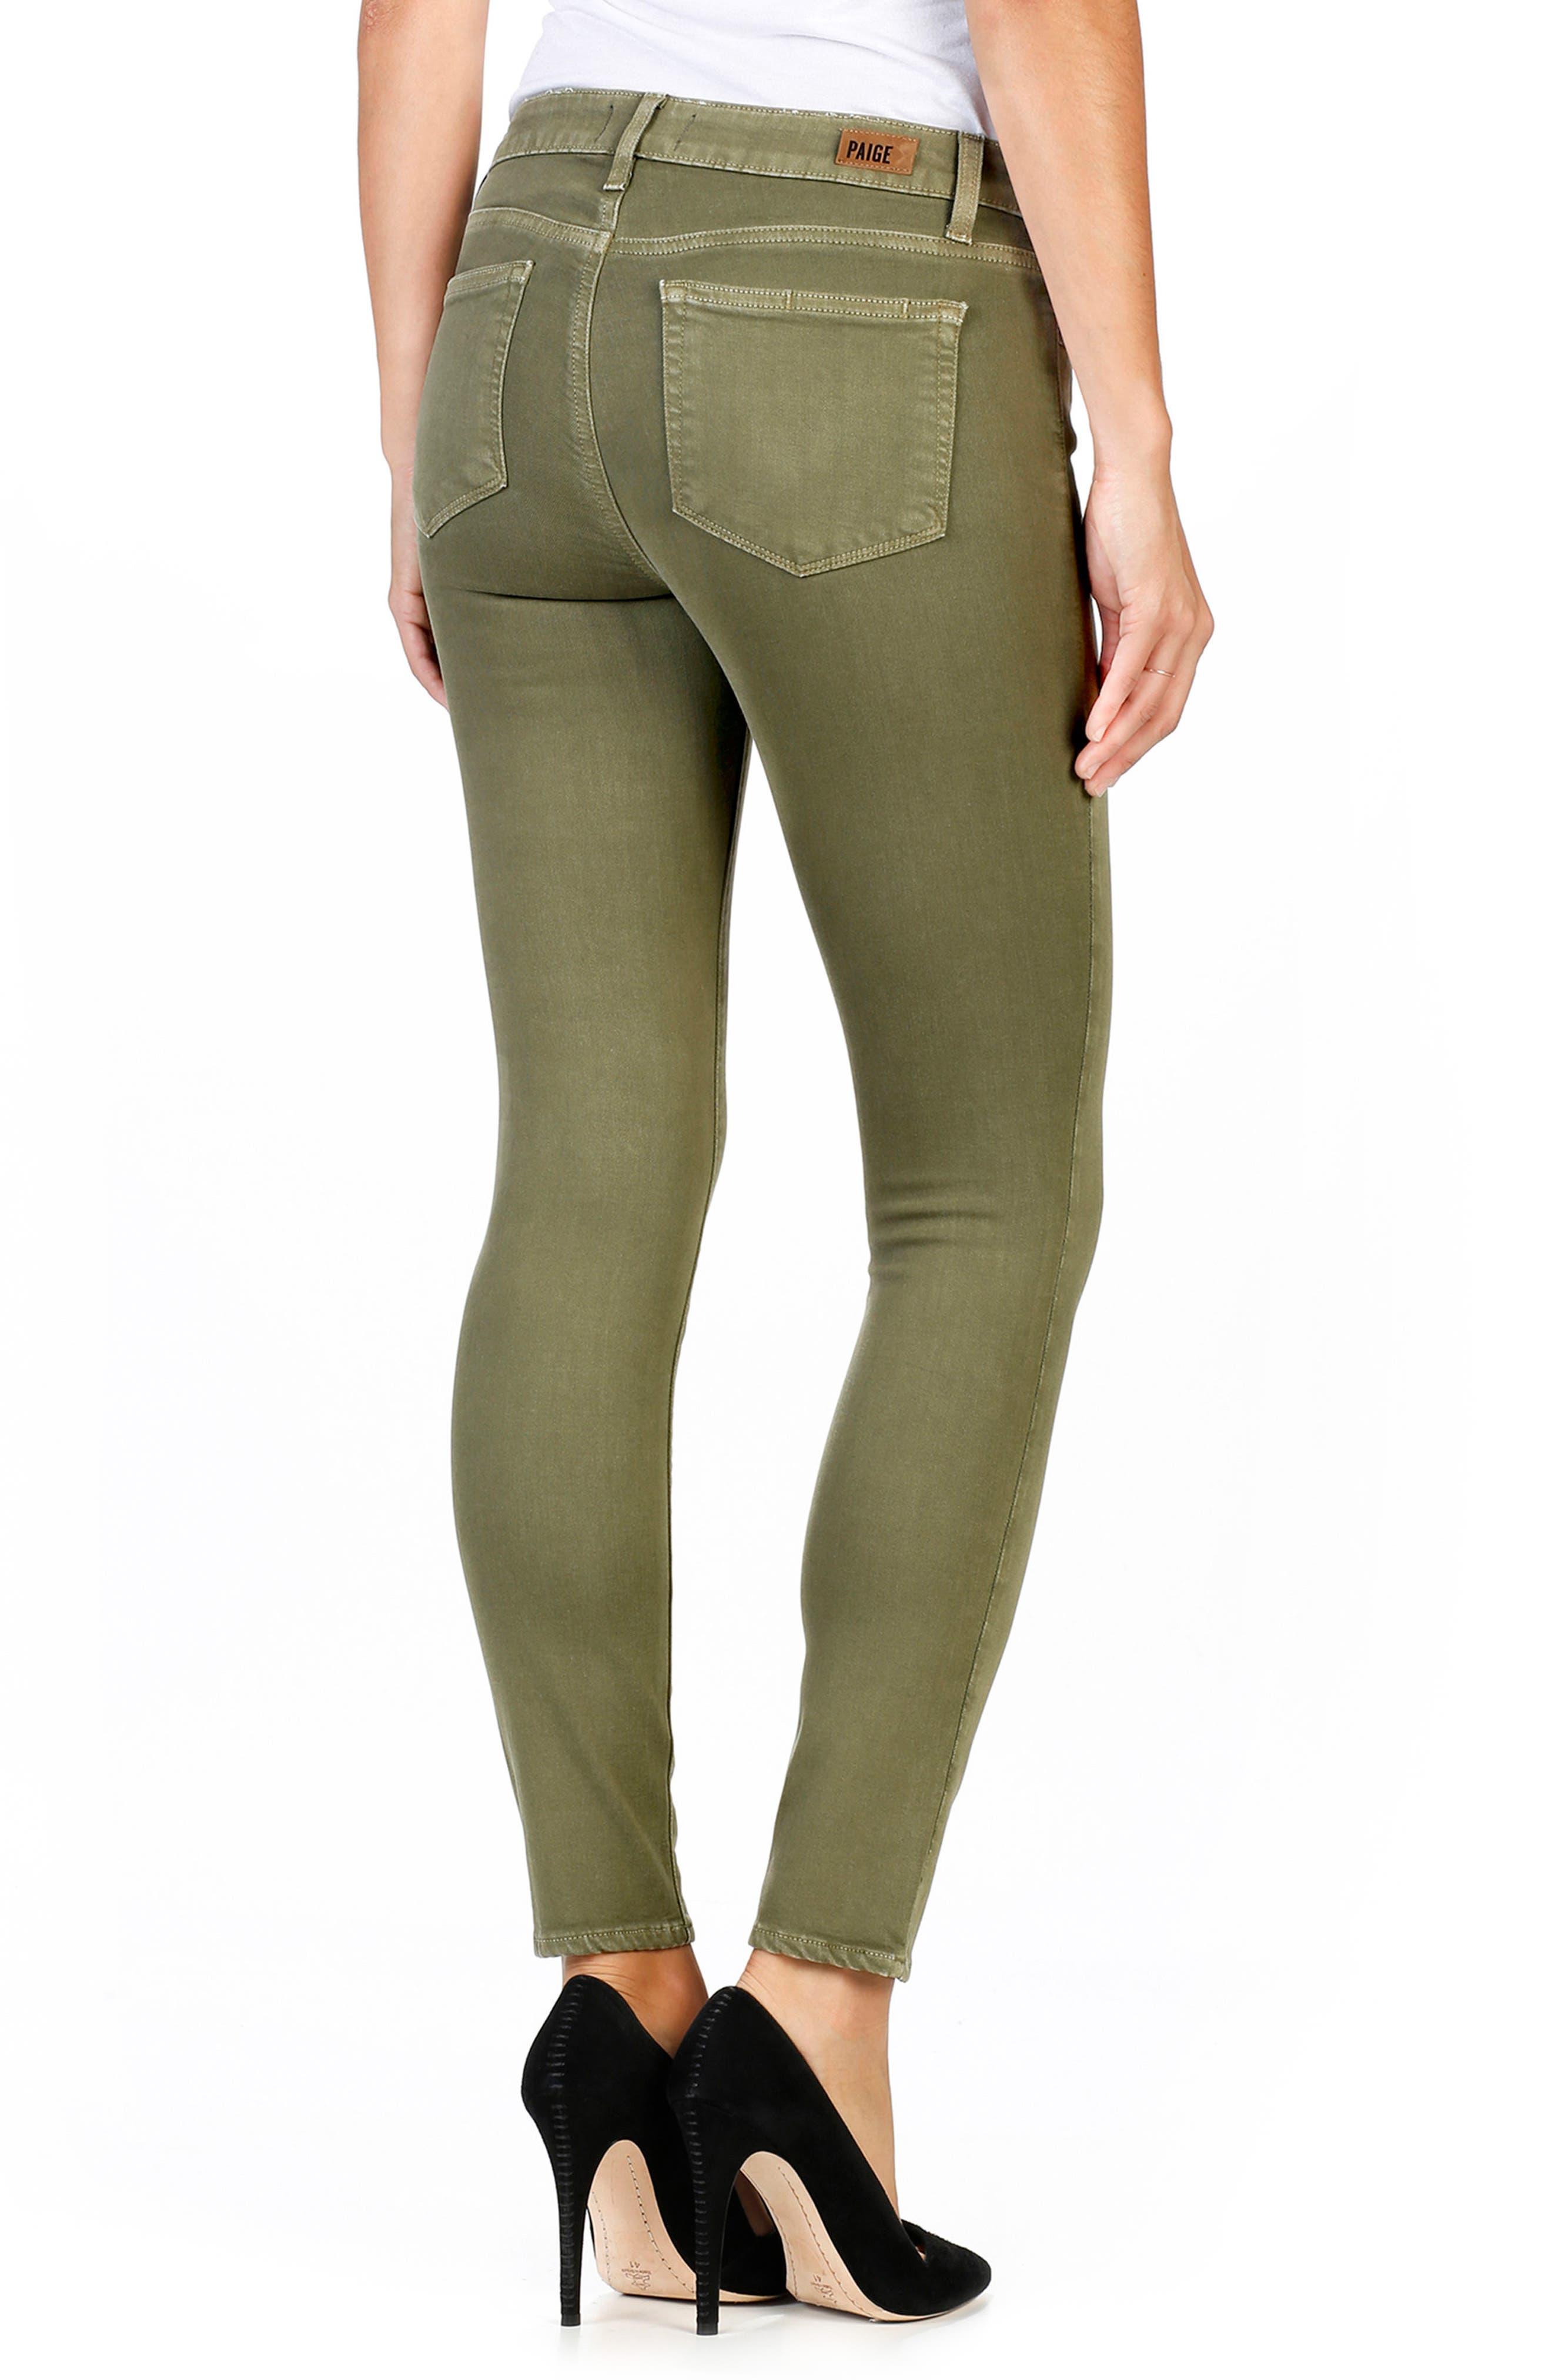 Alternate Image 2  - PAIGE Transcend - Verdugo Ankle Skinny Jeans (Sahara Green)